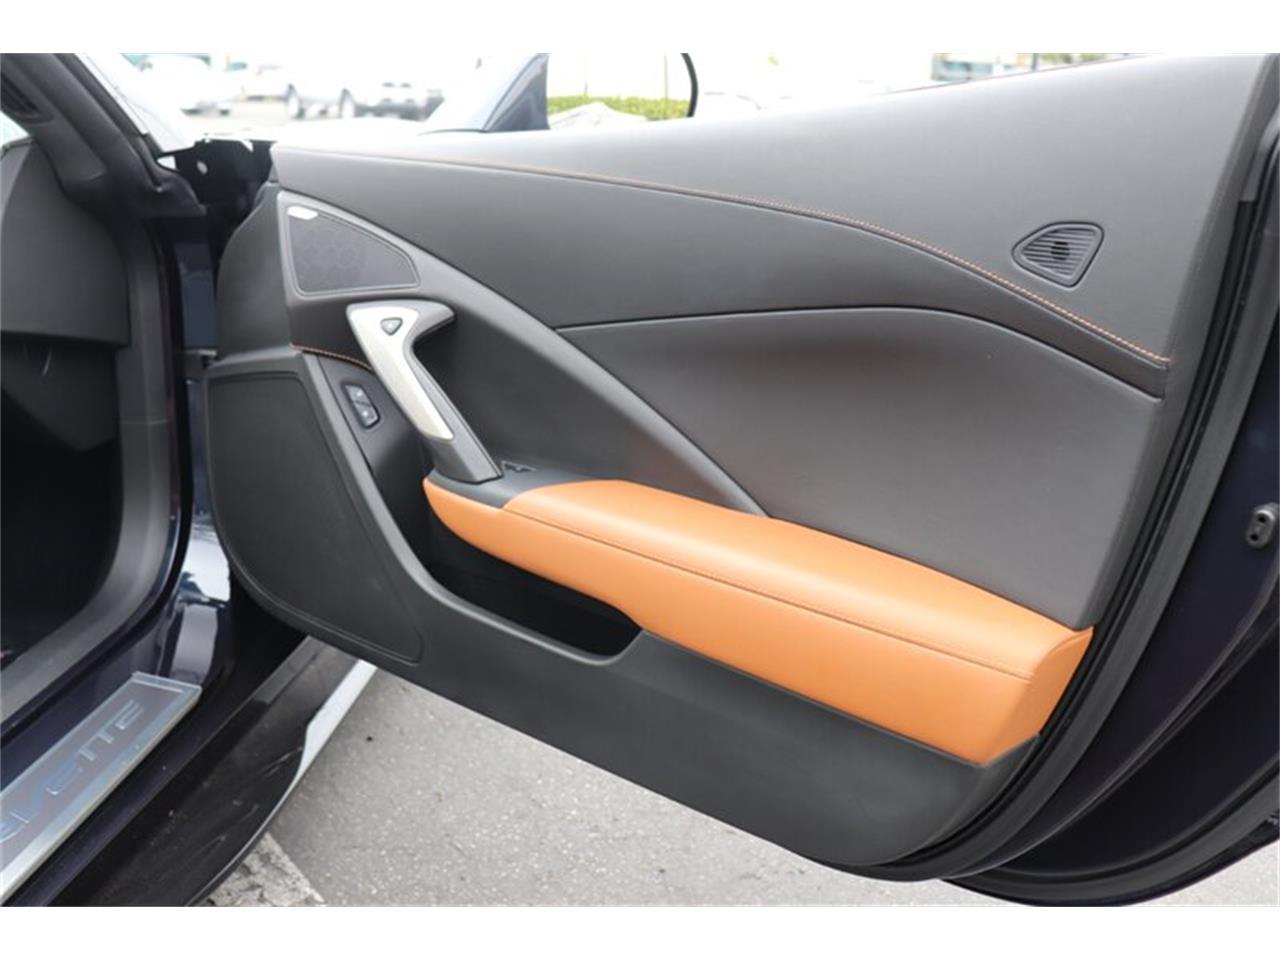 Large Picture of '15 Chevrolet Corvette Z06 located in Anaheim California - QFLK